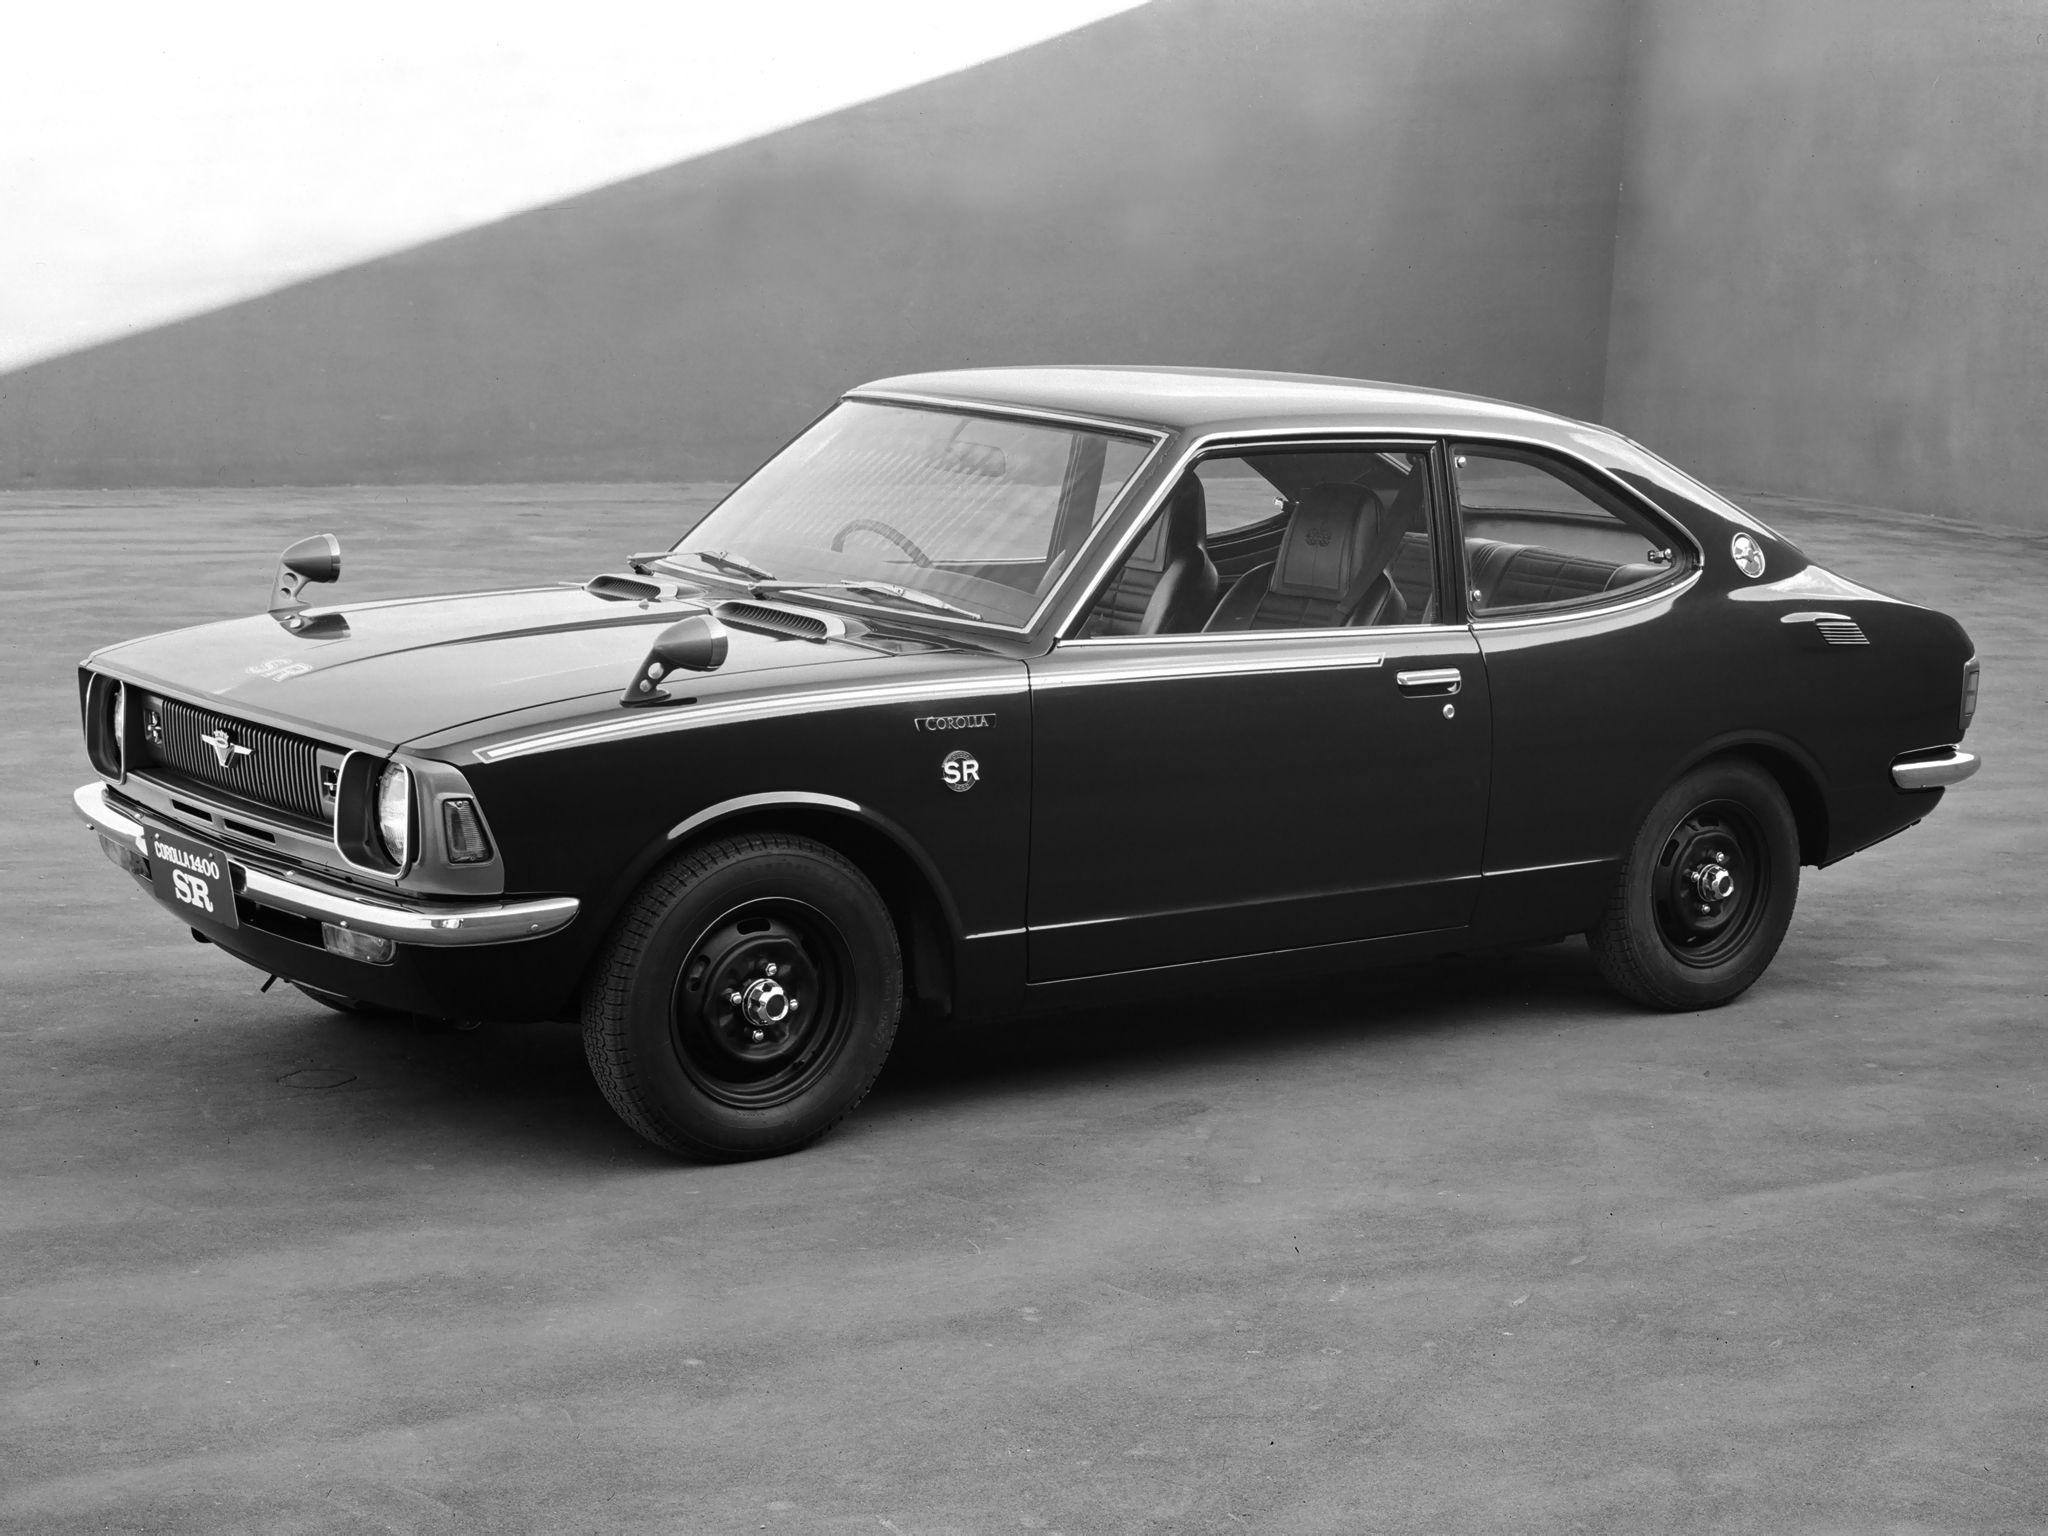 Kekurangan Toyota Corolla 1970 Perbandingan Harga